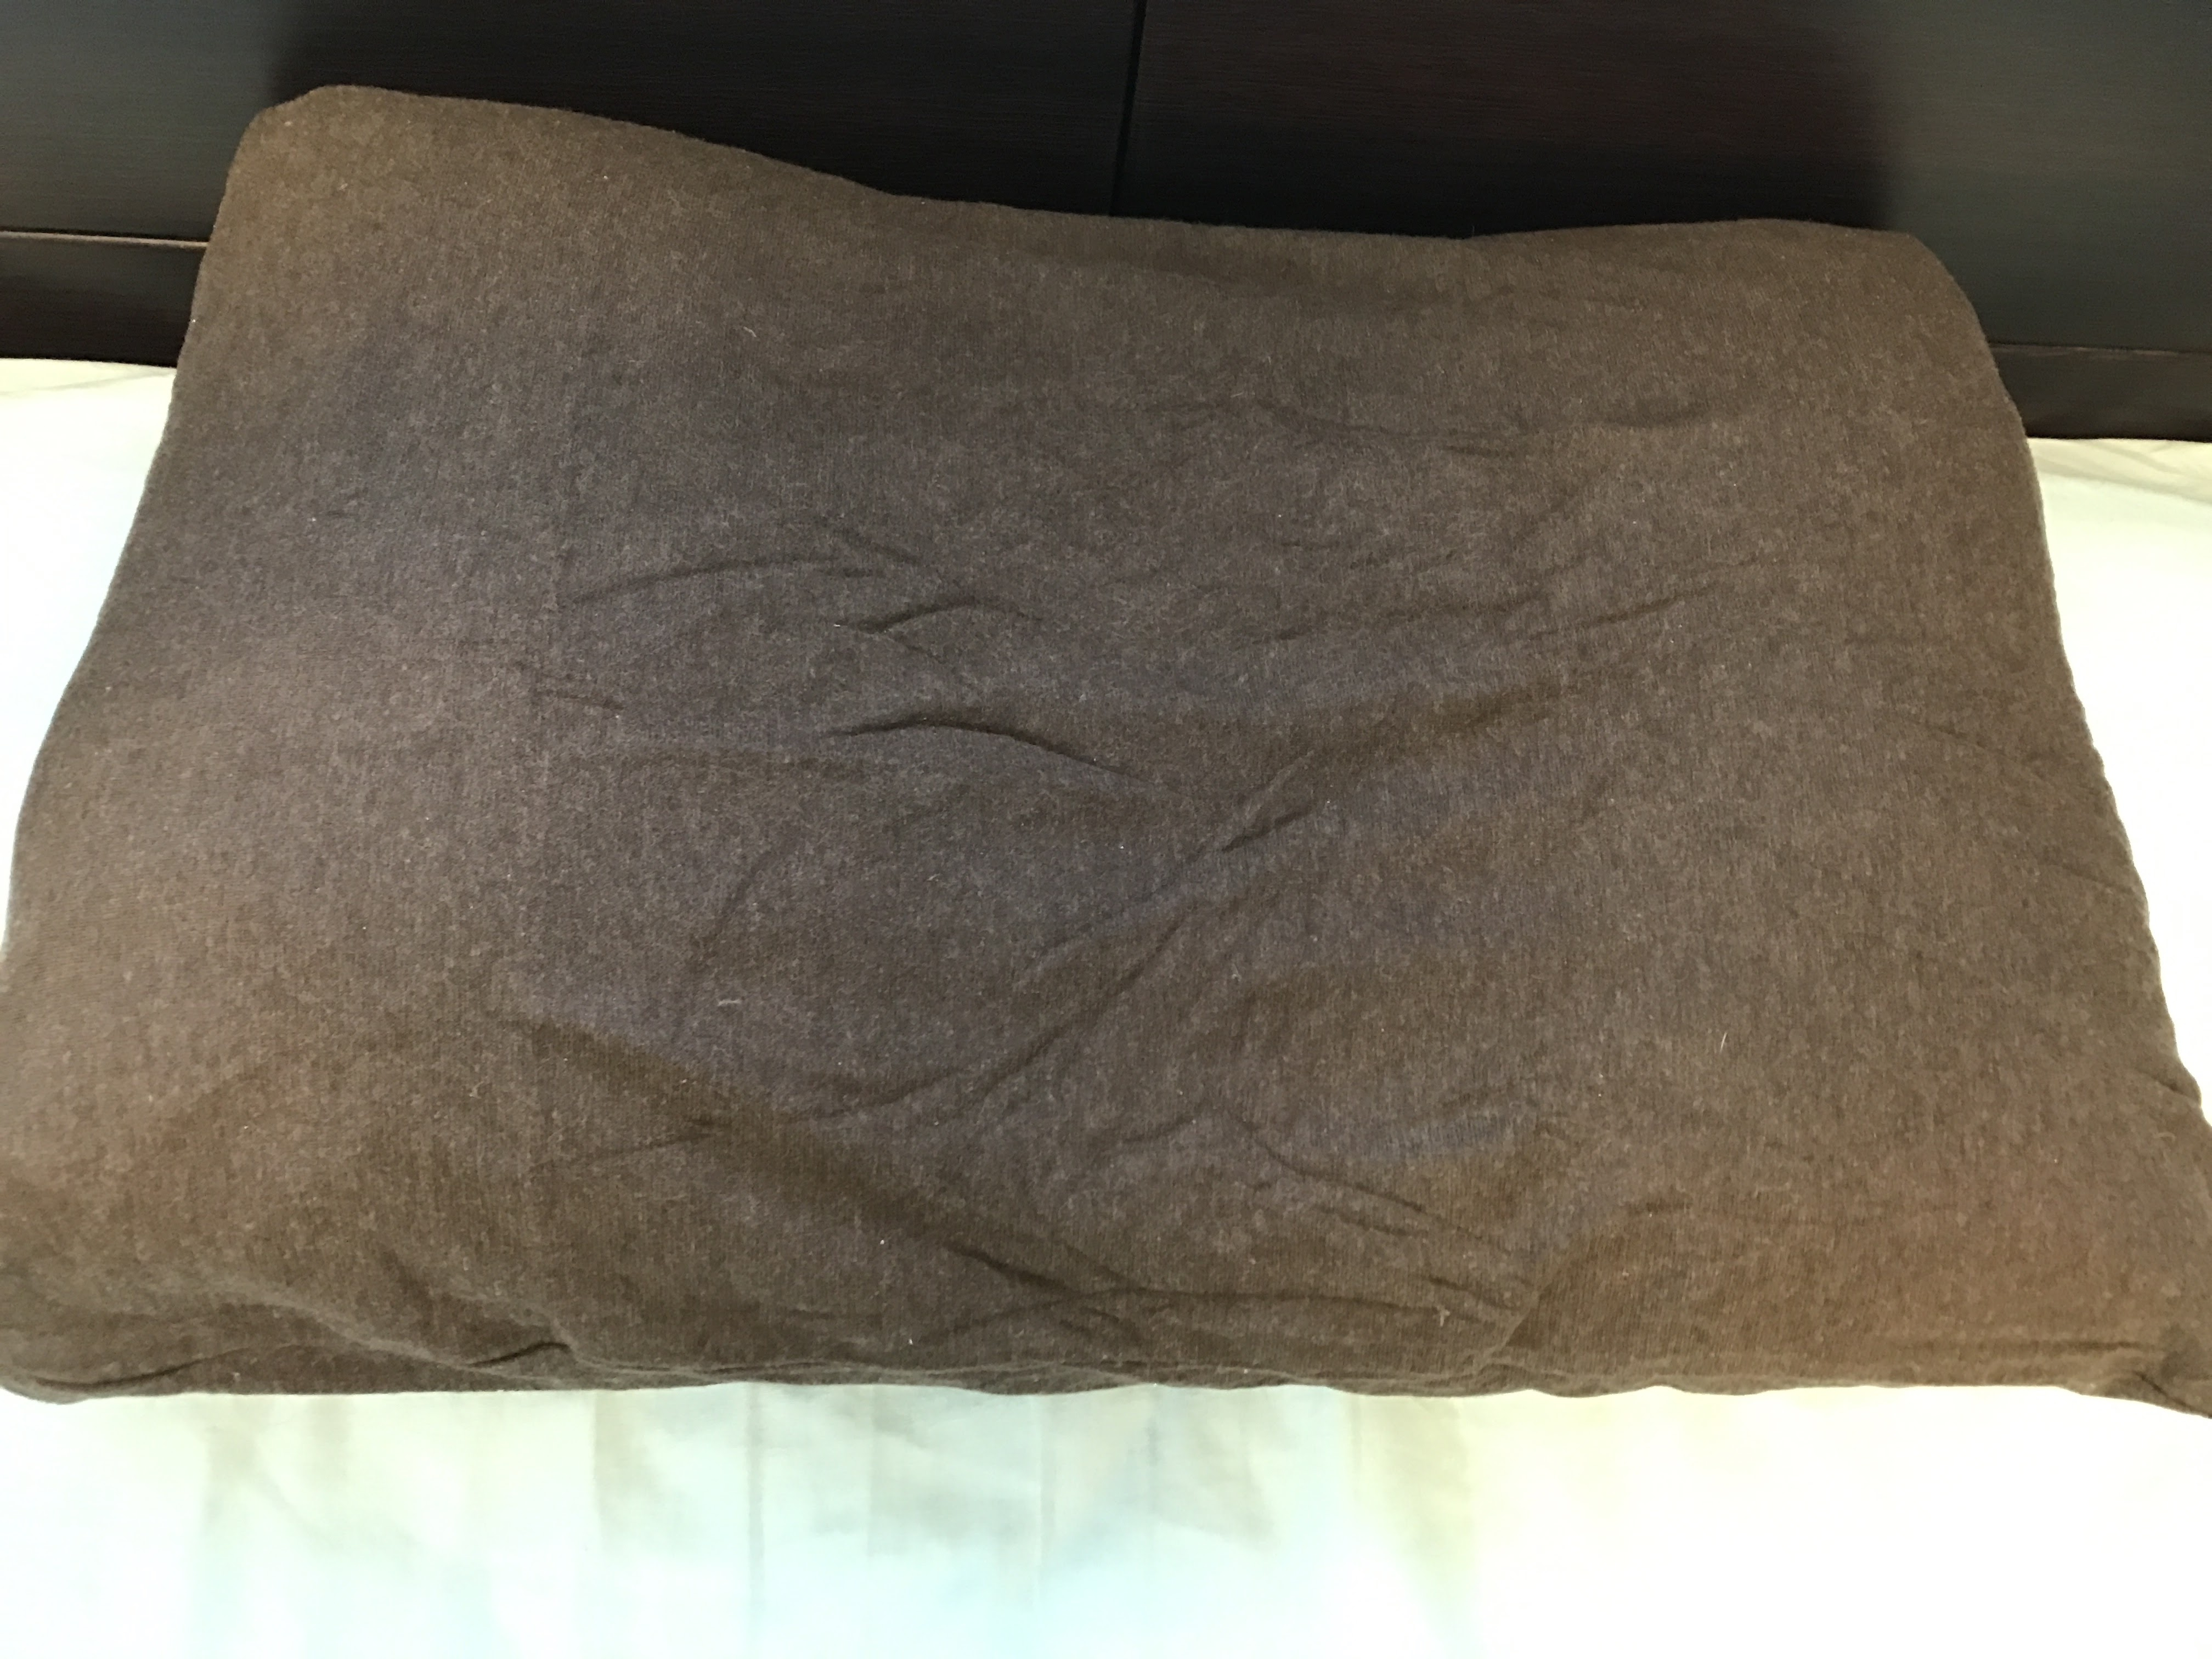 Lacooneru(ラクネル)に枕カバーをつけてみた